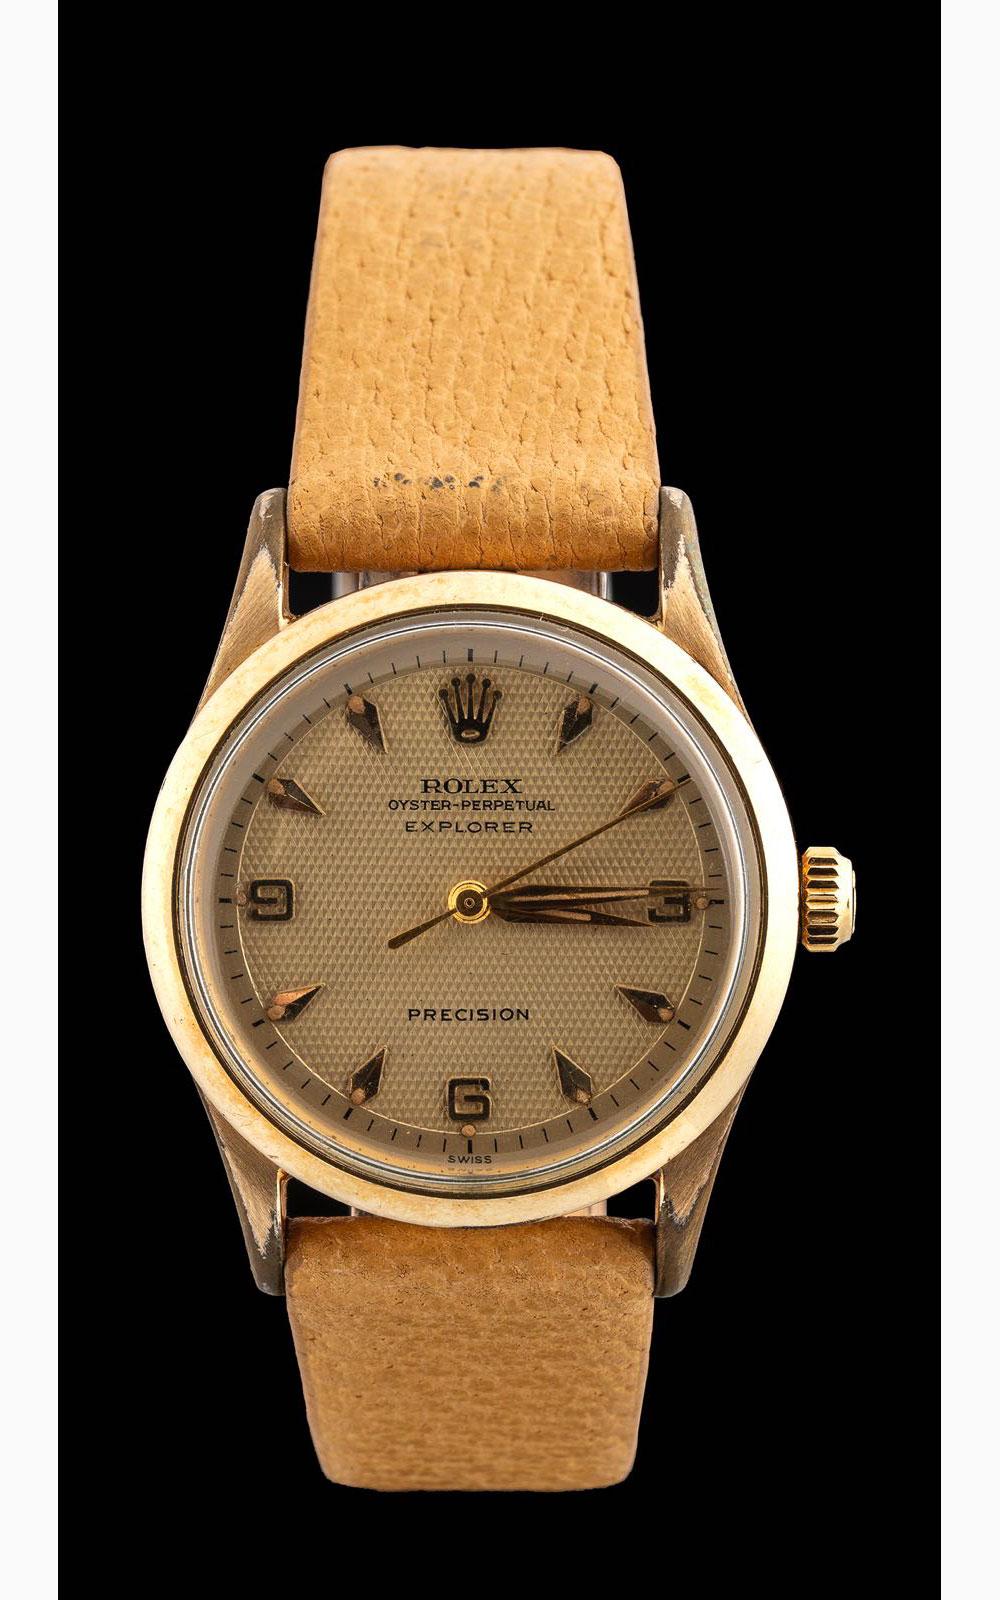 Rolex Explorer guilloche dial ref 5506 Gold filled '1950